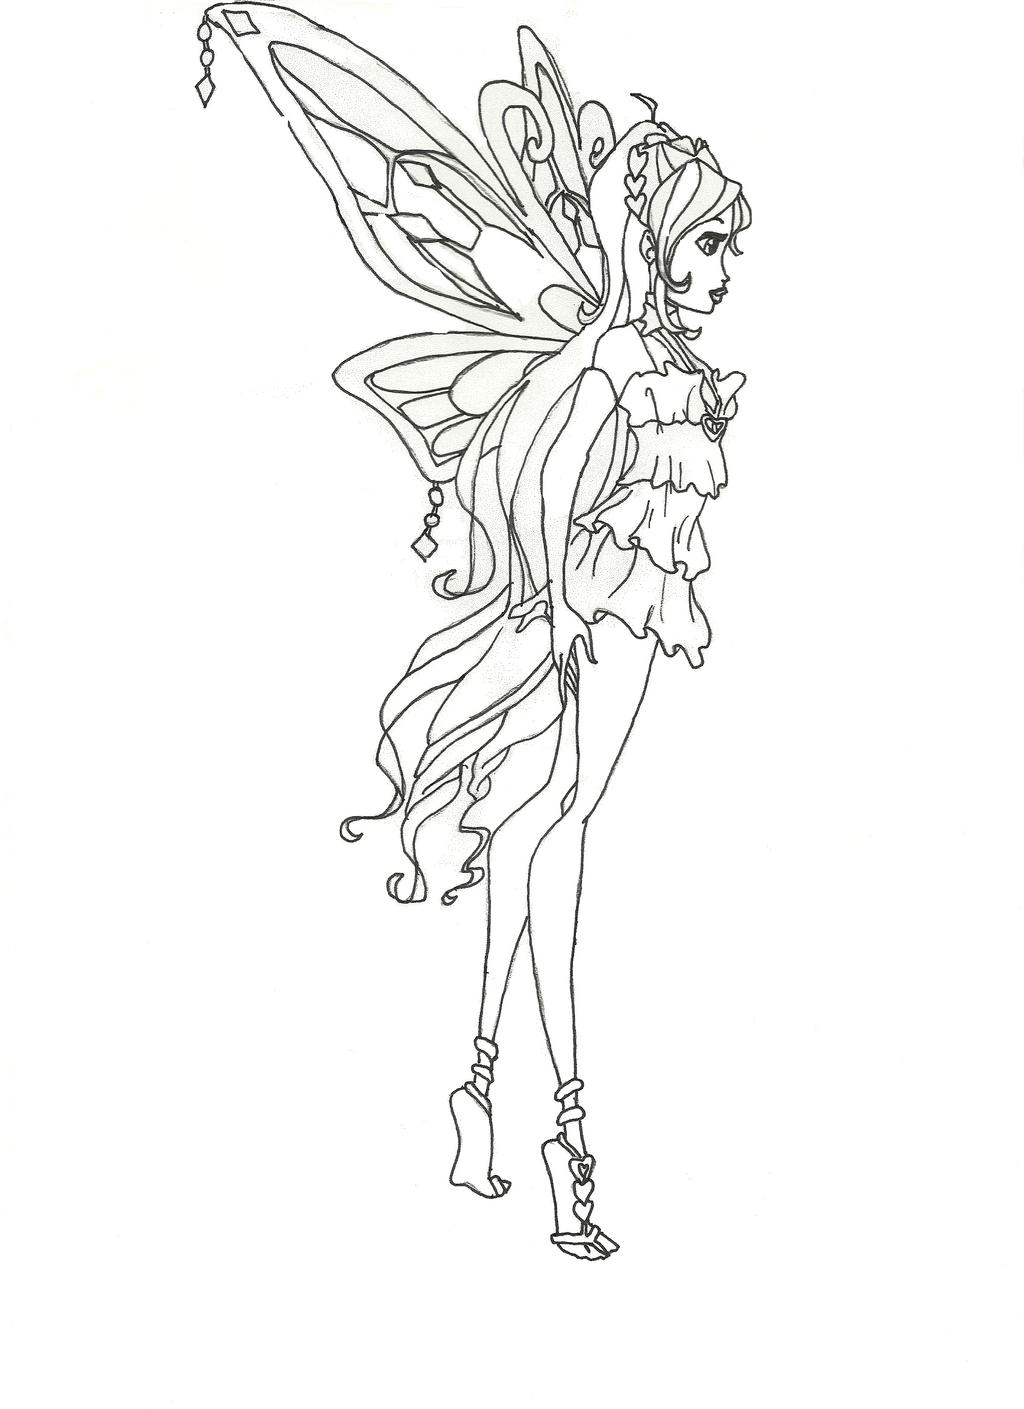 winx club bloom enchantix coloring pages - winx club enchantix bloom coloring page side view by